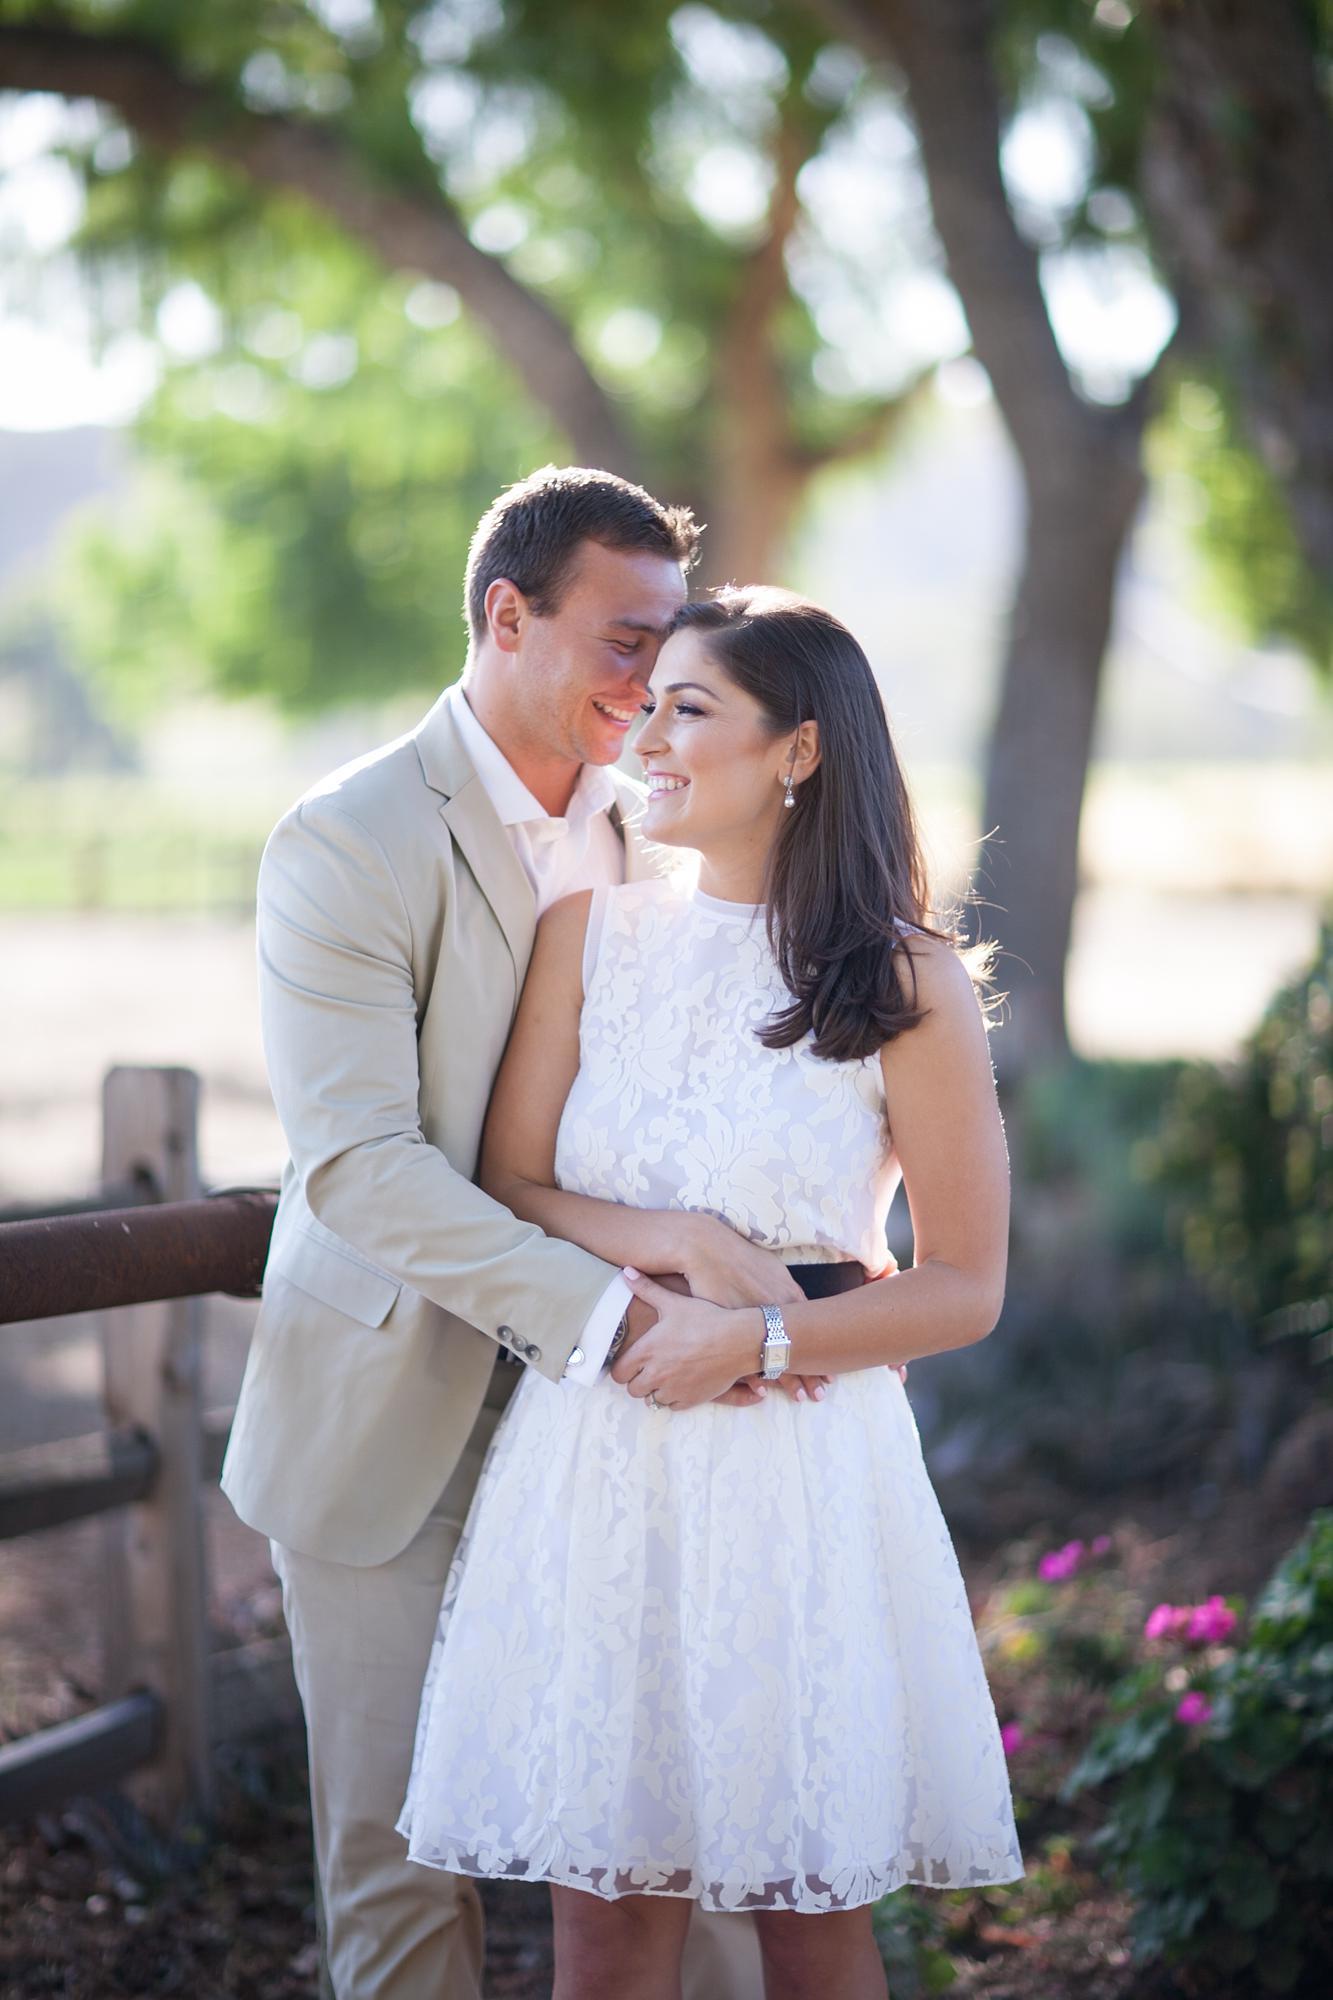 Santa Ynez Vineyard Engagement | Miki & Sonja Photography | mikiandsonja.com